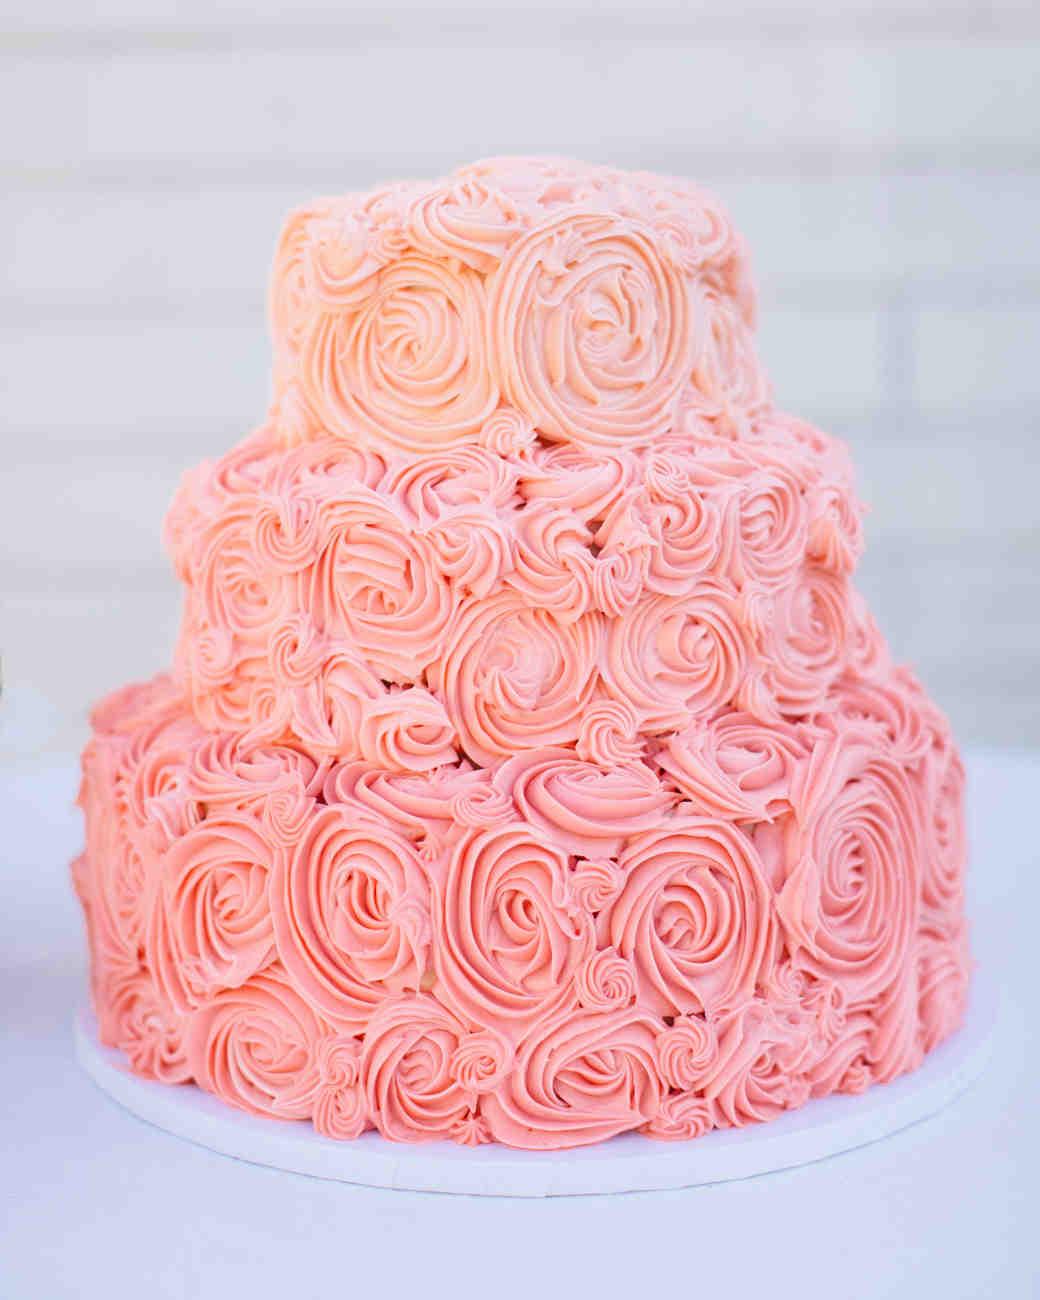 pink swirled buttercream cake